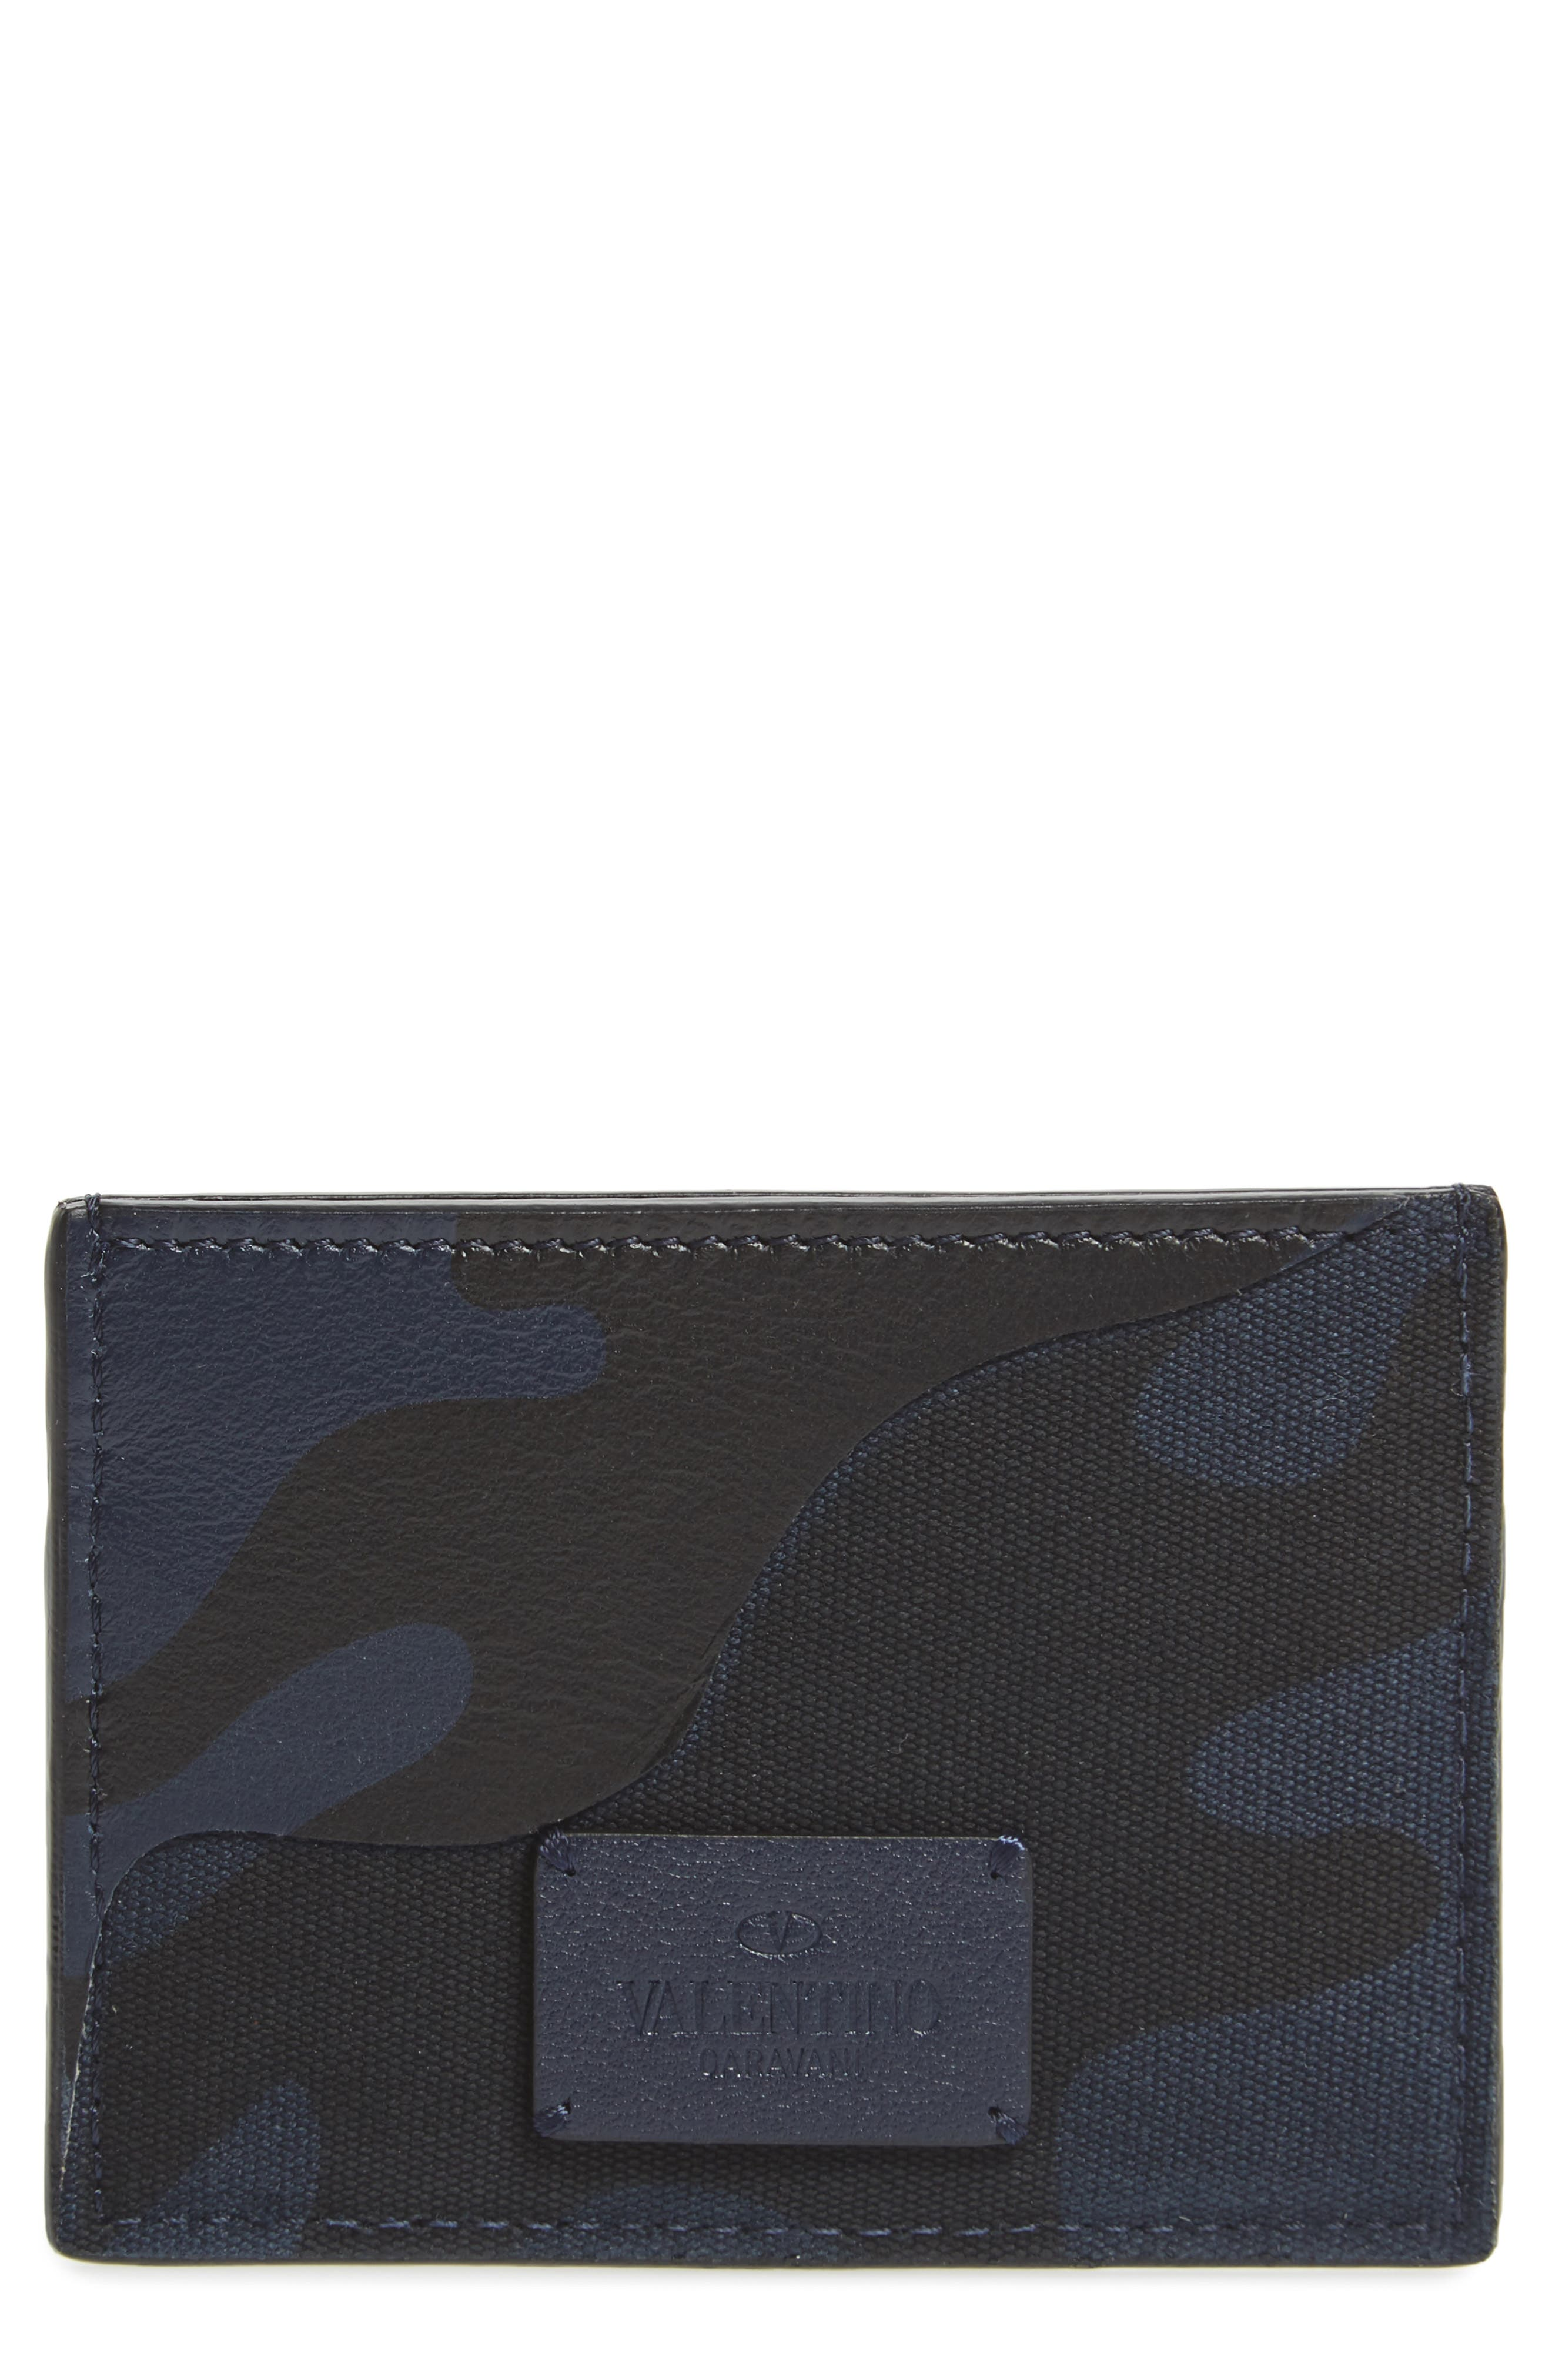 GARAVANI Camo Nylon & Leather Card Case,                             Main thumbnail 1, color,                             MARINE